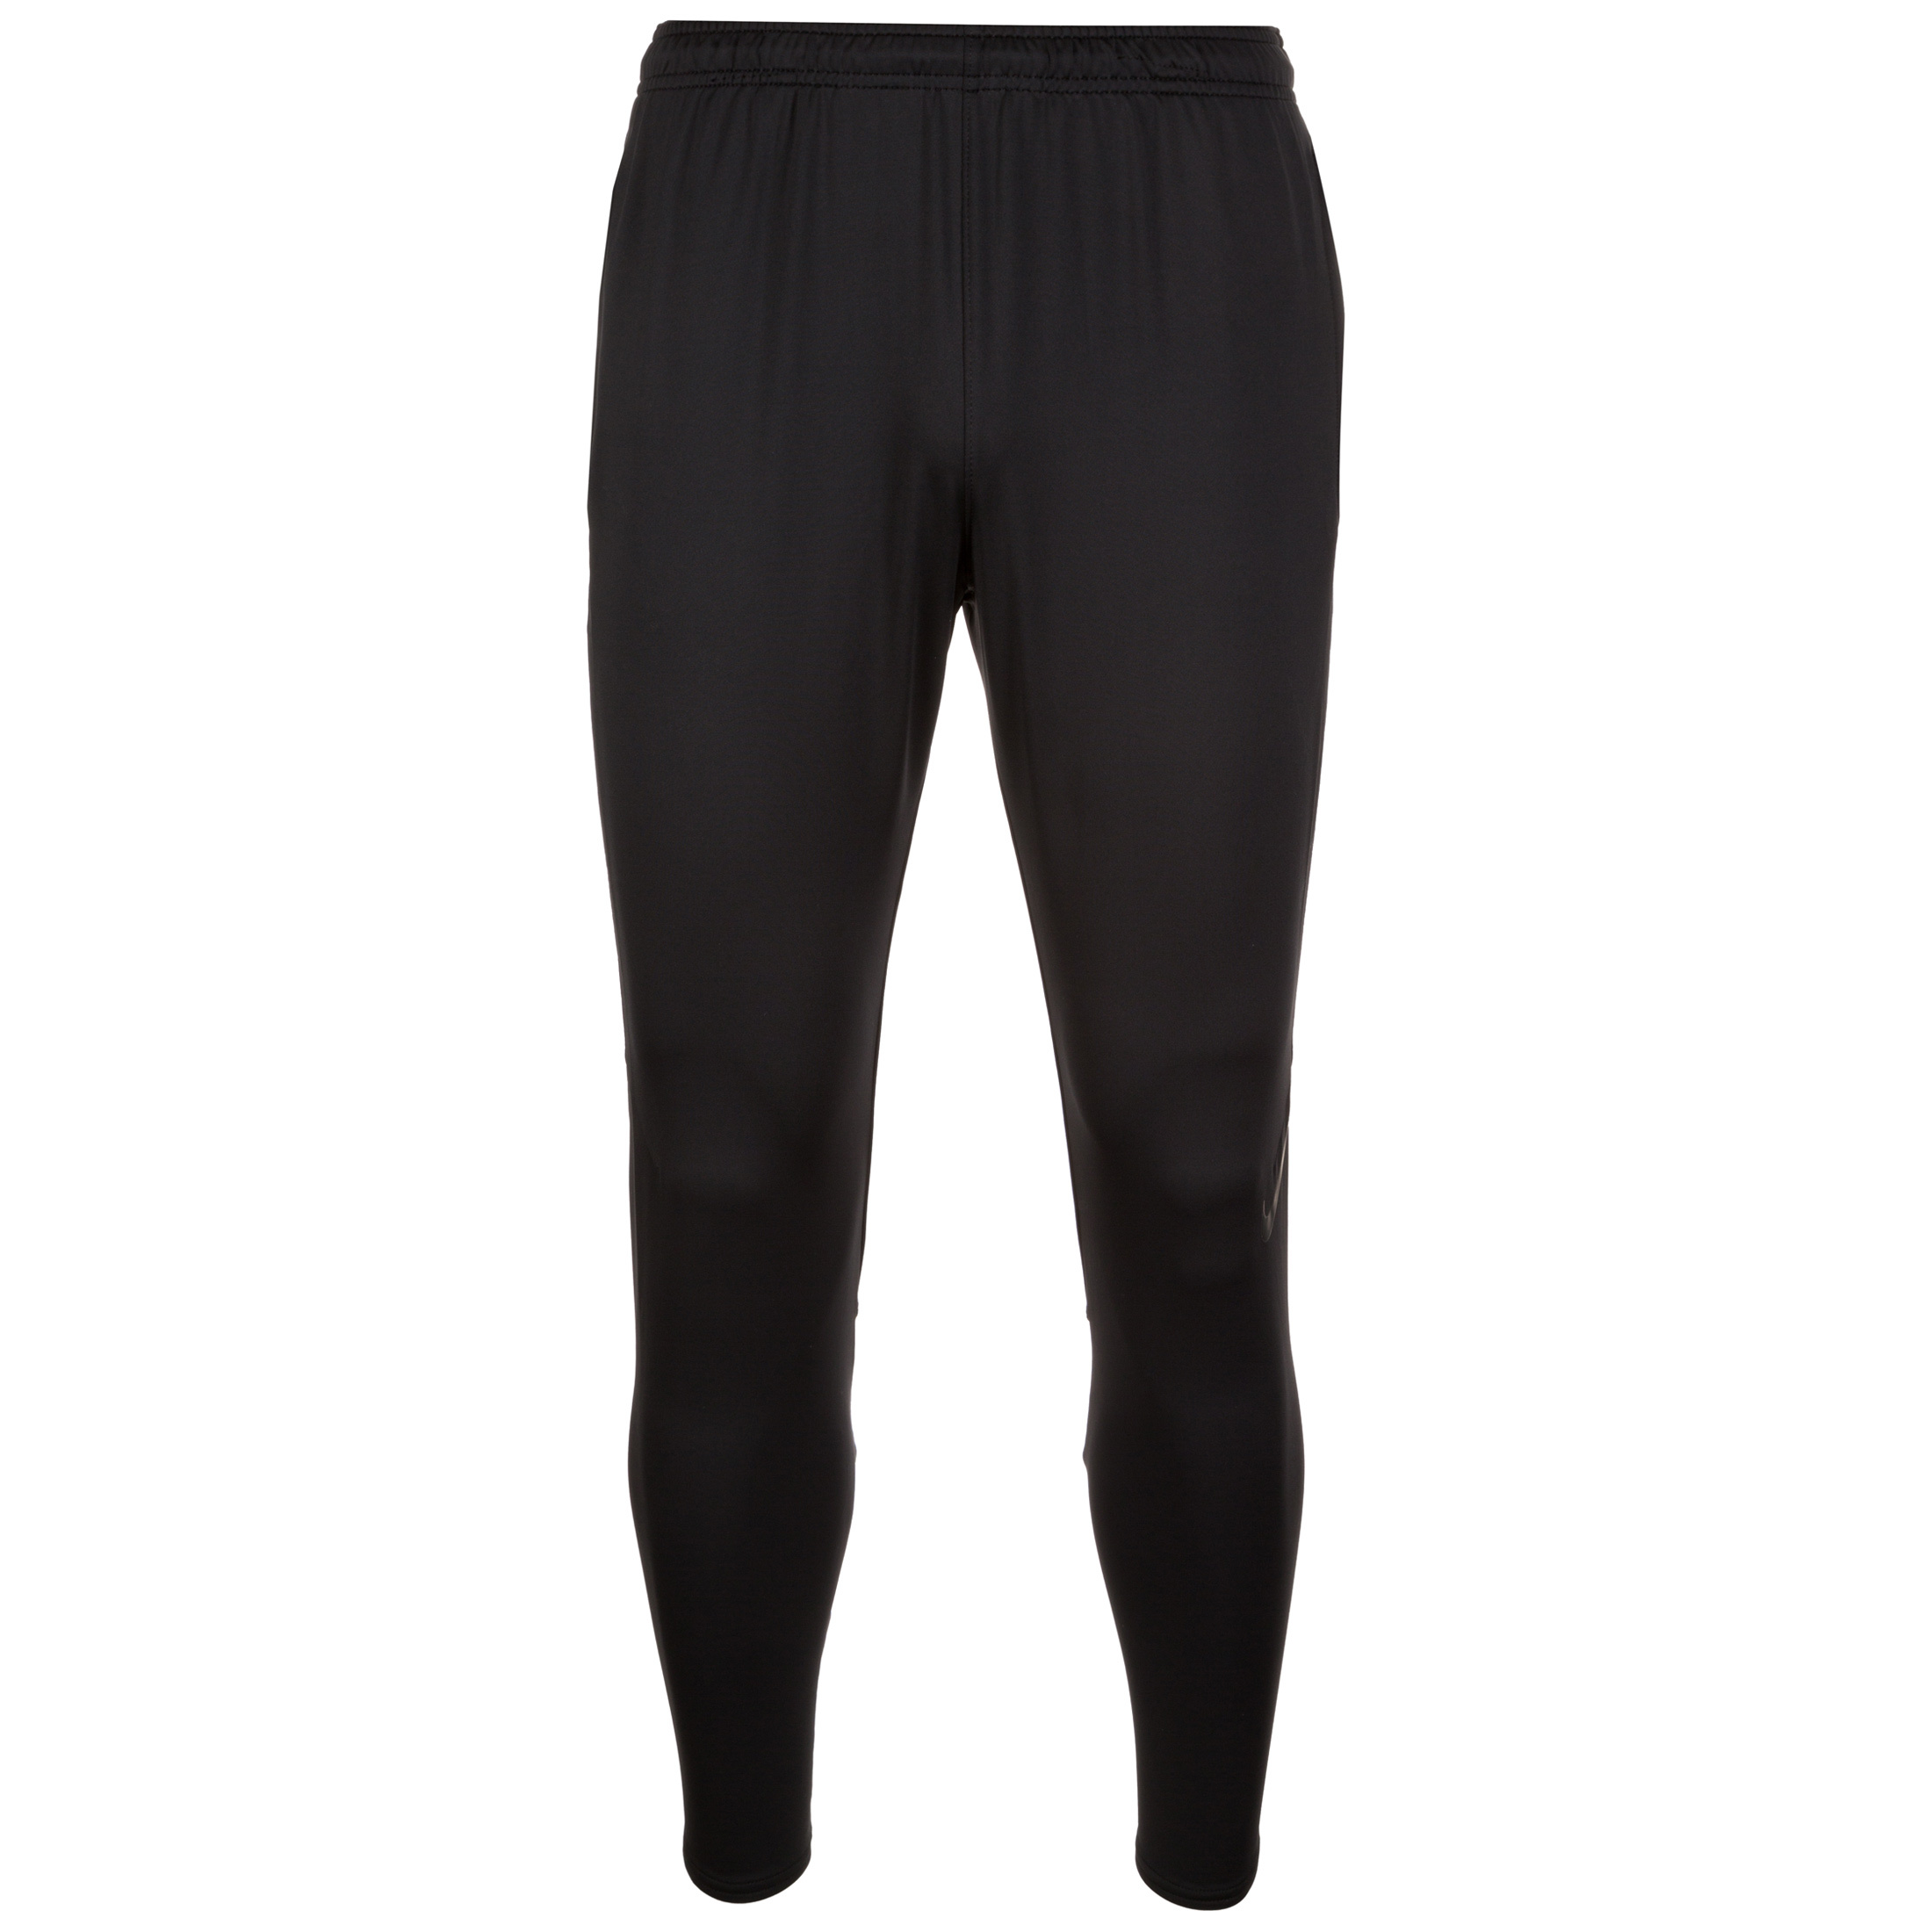 NIKE Dry Squad 18 Pant Hose lang (010)